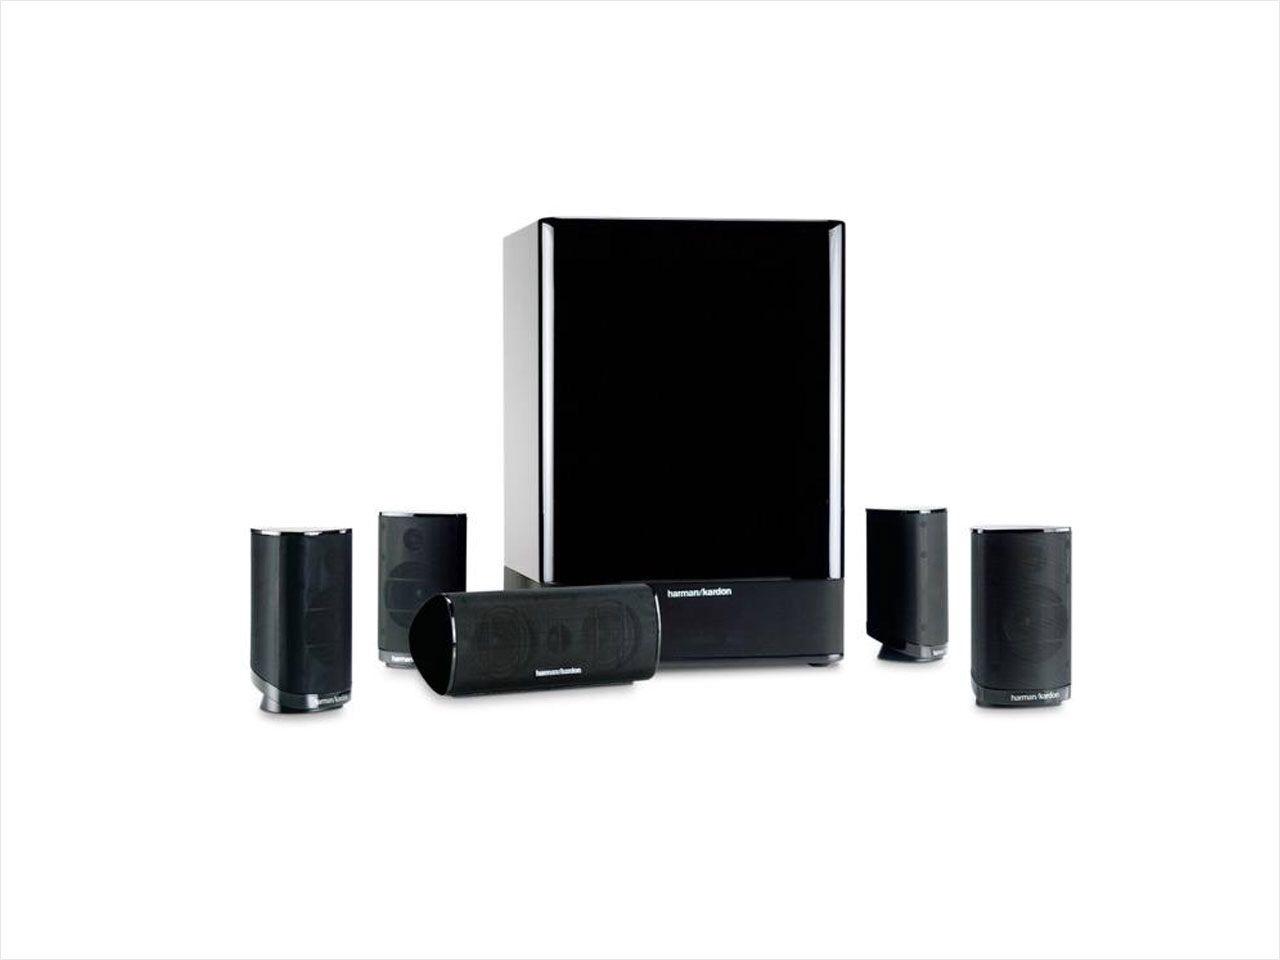 Harman Kardon HKTS 15 5.1 Home Theater Speaker System $155 FS neweggflash